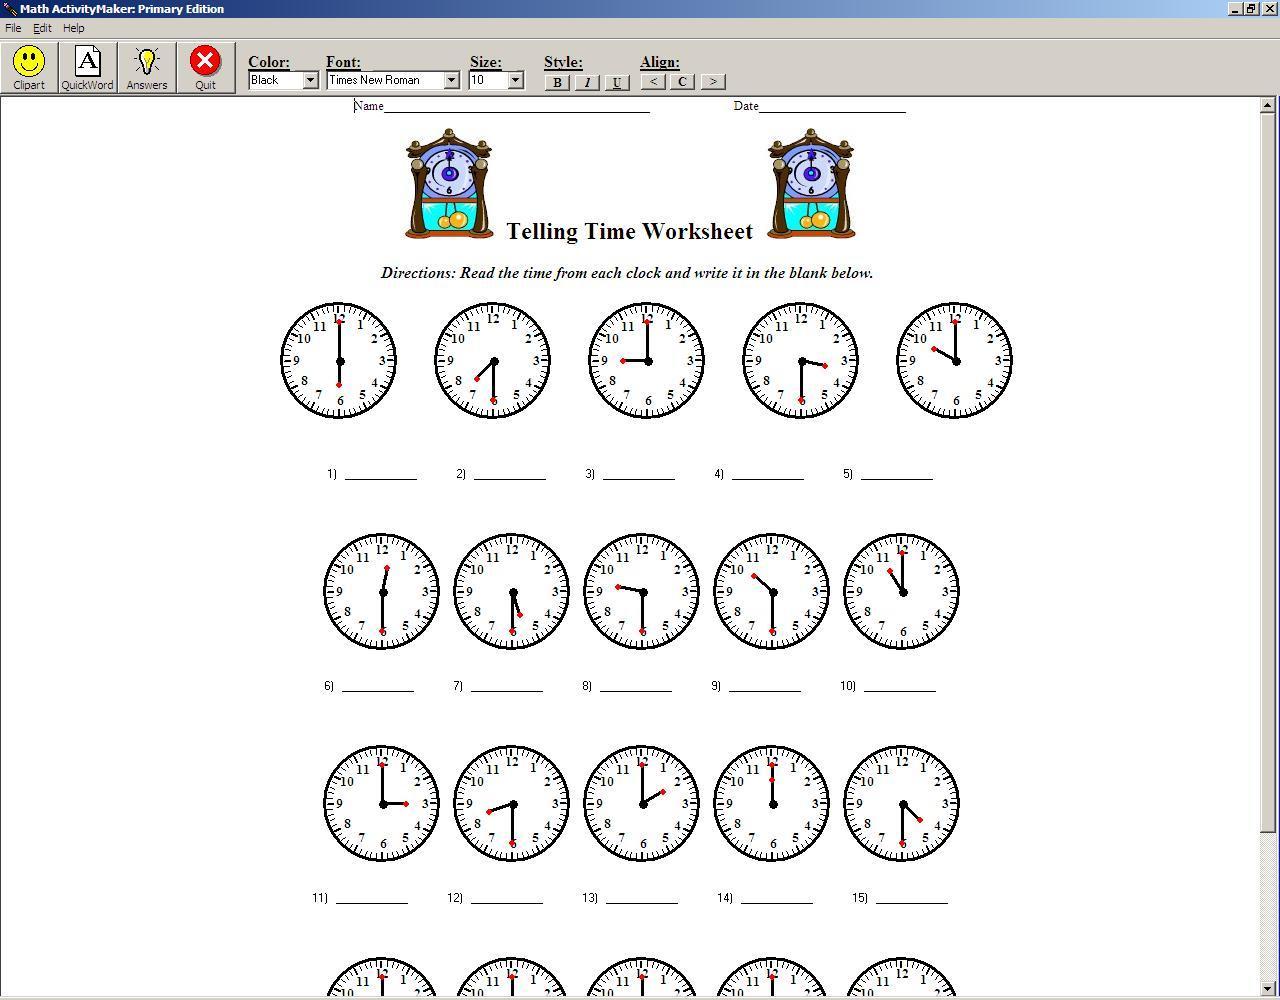 Math Activitymaker Primary Software Informer Screenshots